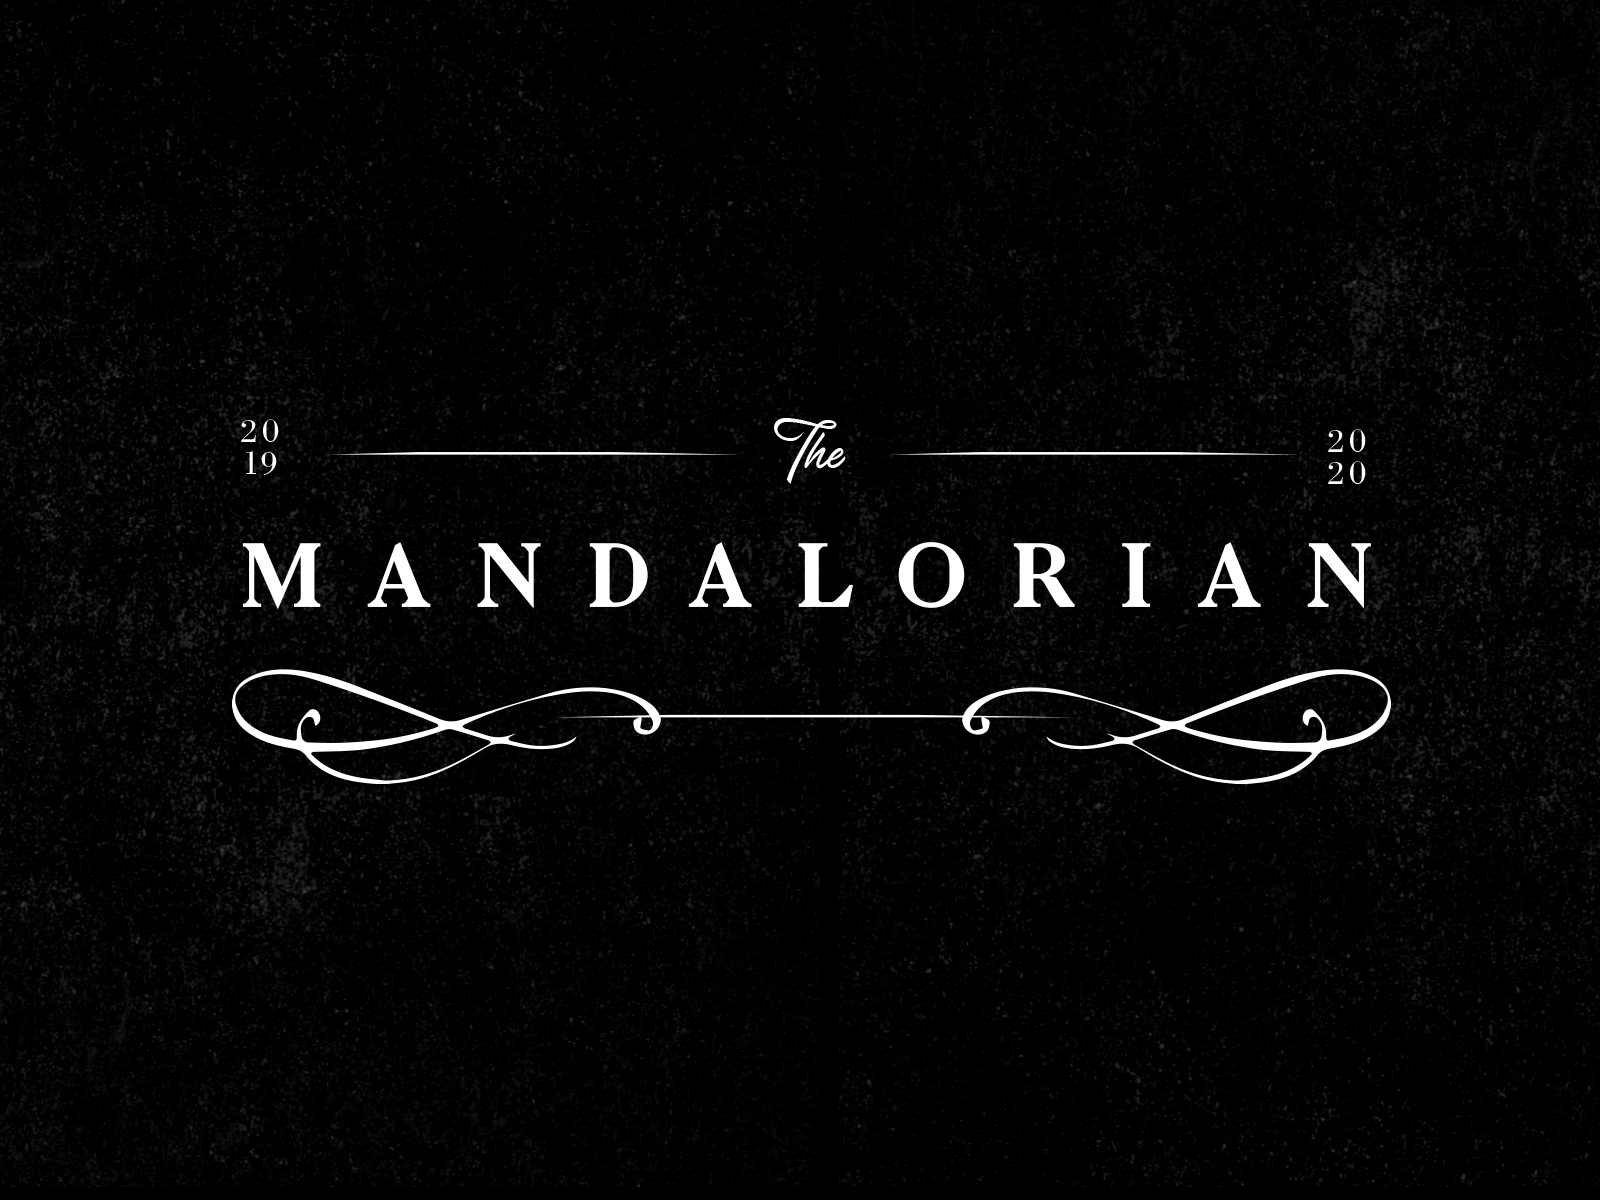 The Mandalorian Logo By Mauro Faustino On Dribbble